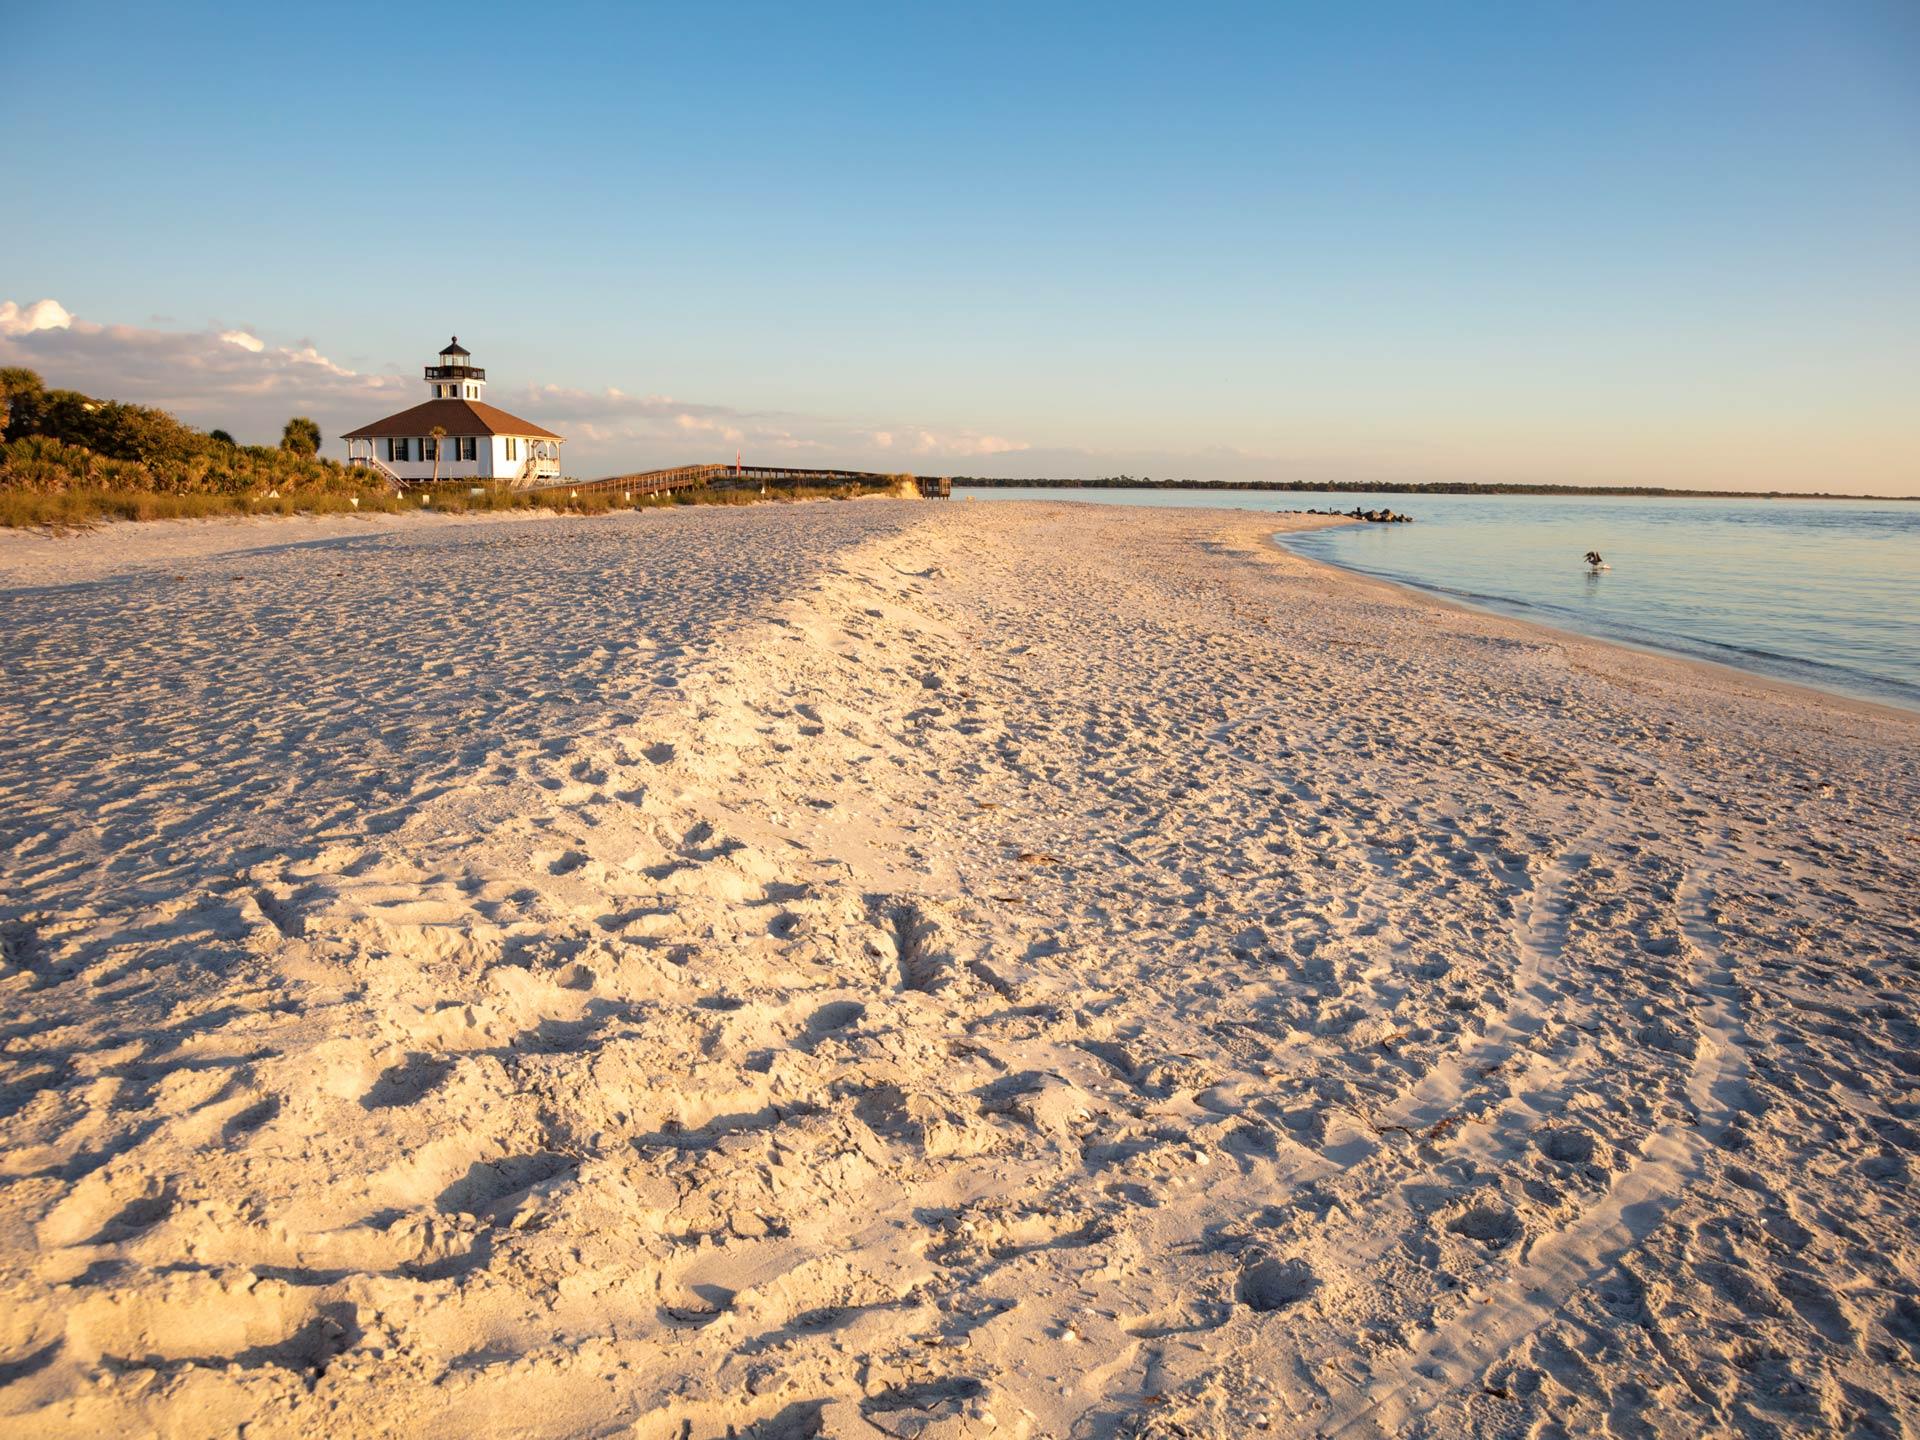 A beach in Boca Grande Florida, overlooking a lighthouse